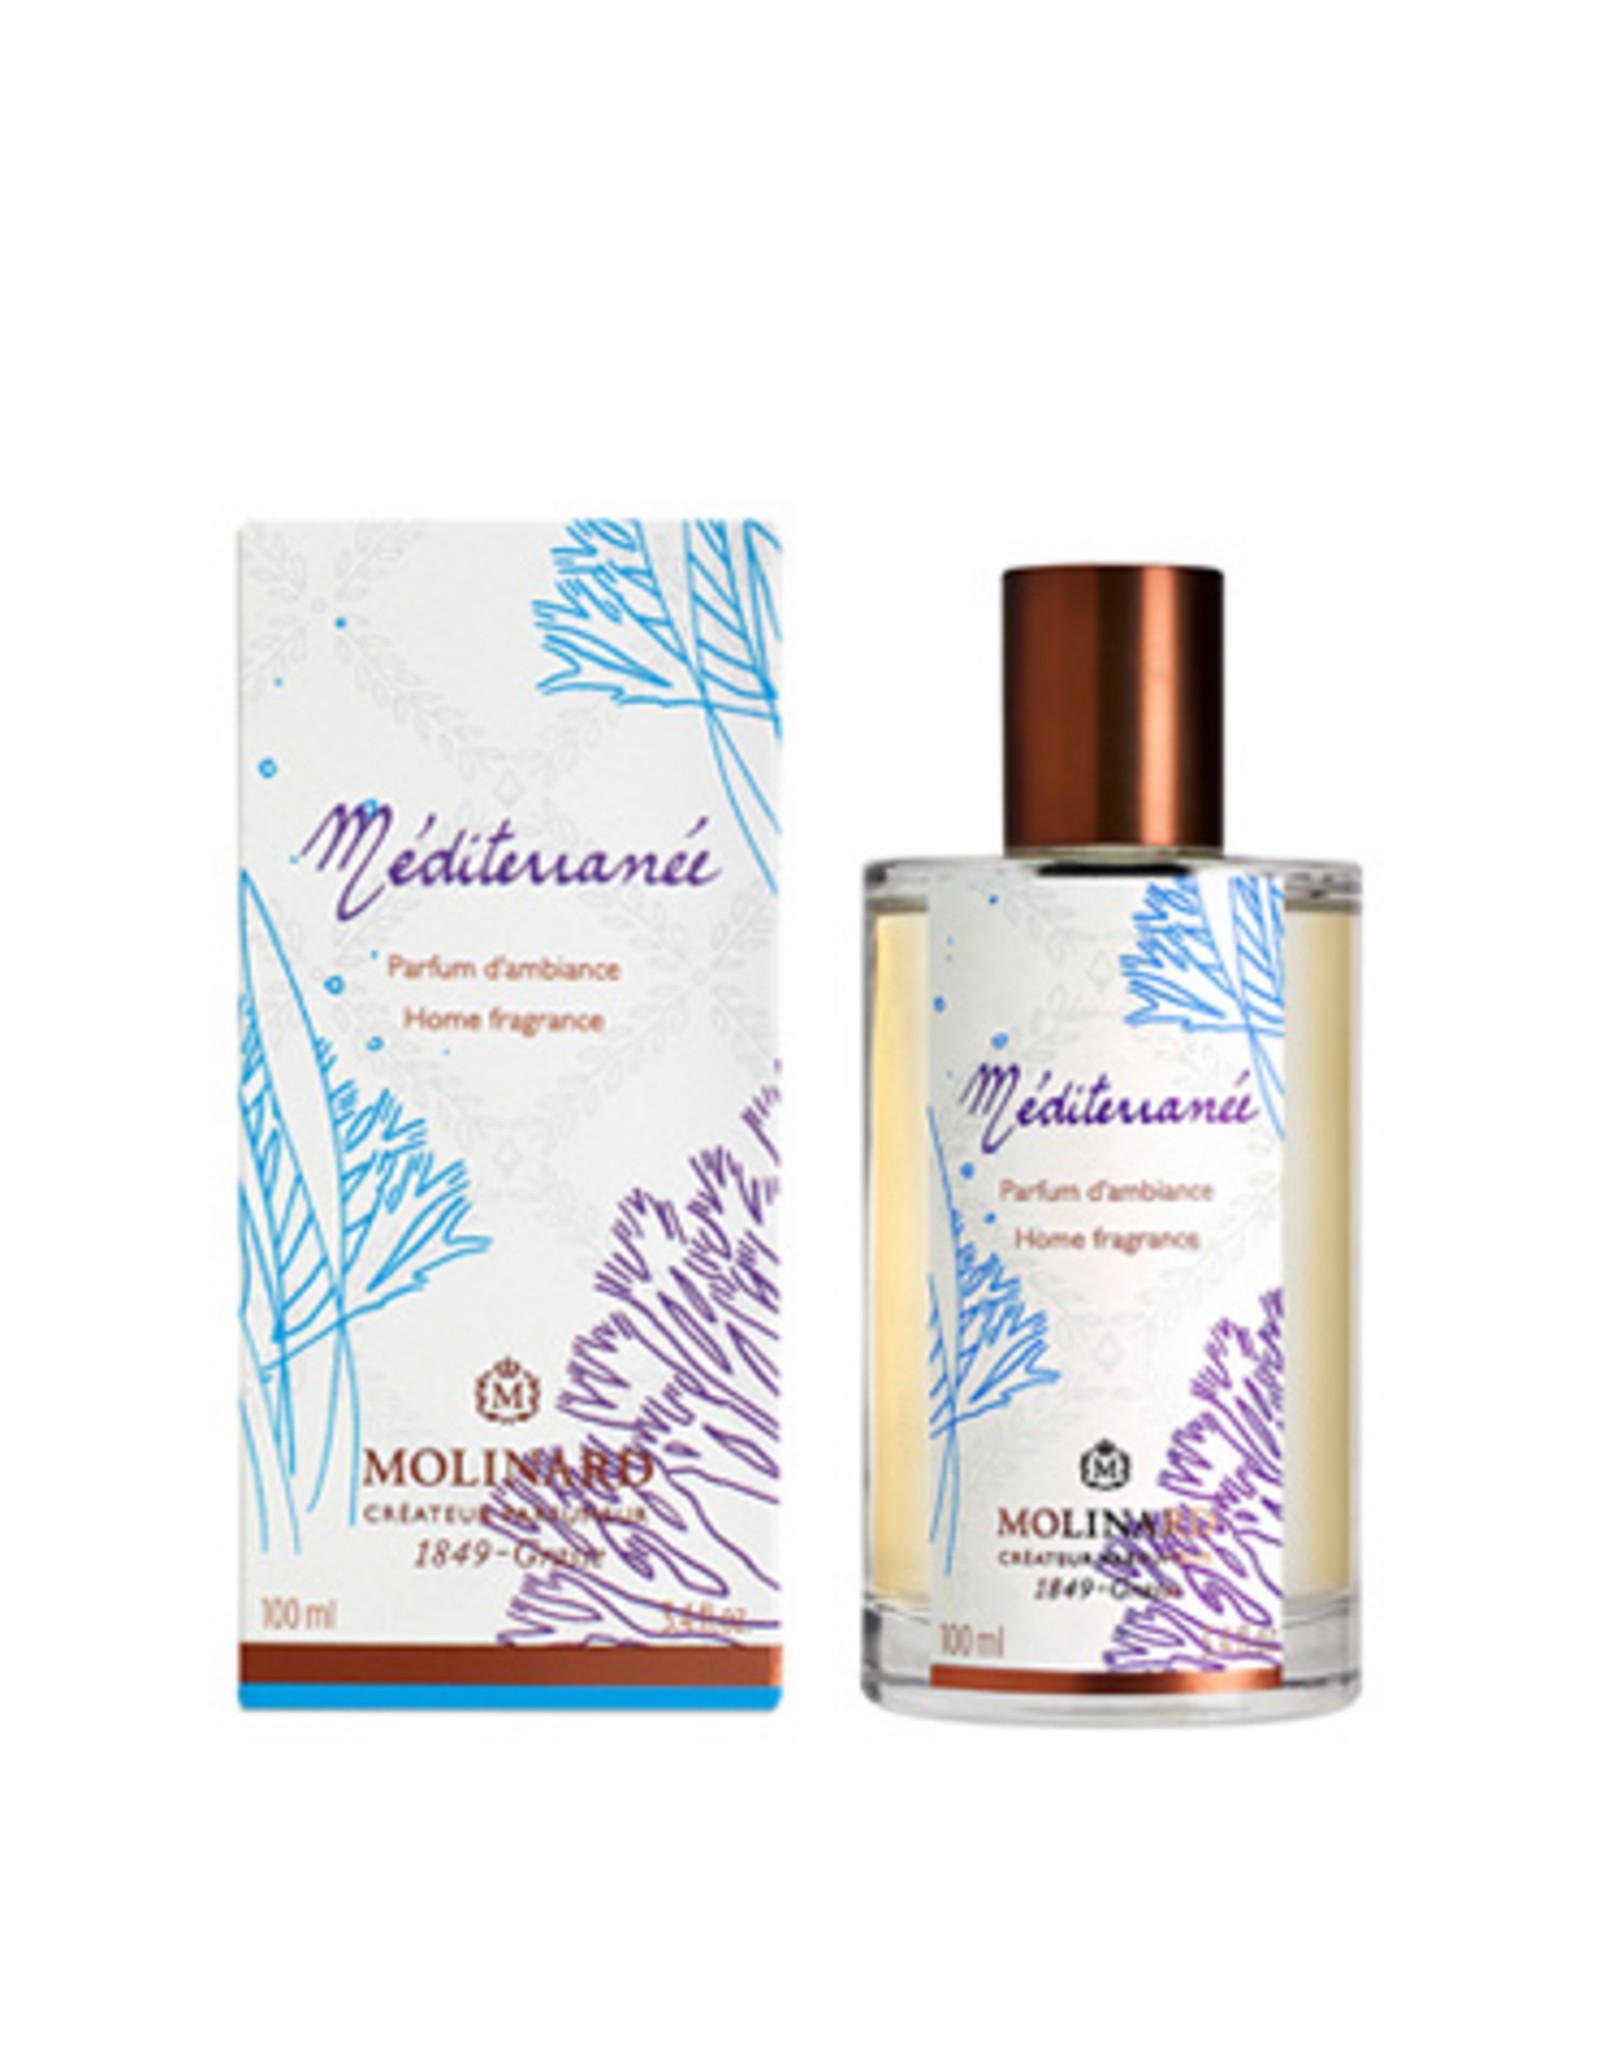 Molinard Méditerranée - Spray d'ambiance - Home Parfum - Molinard